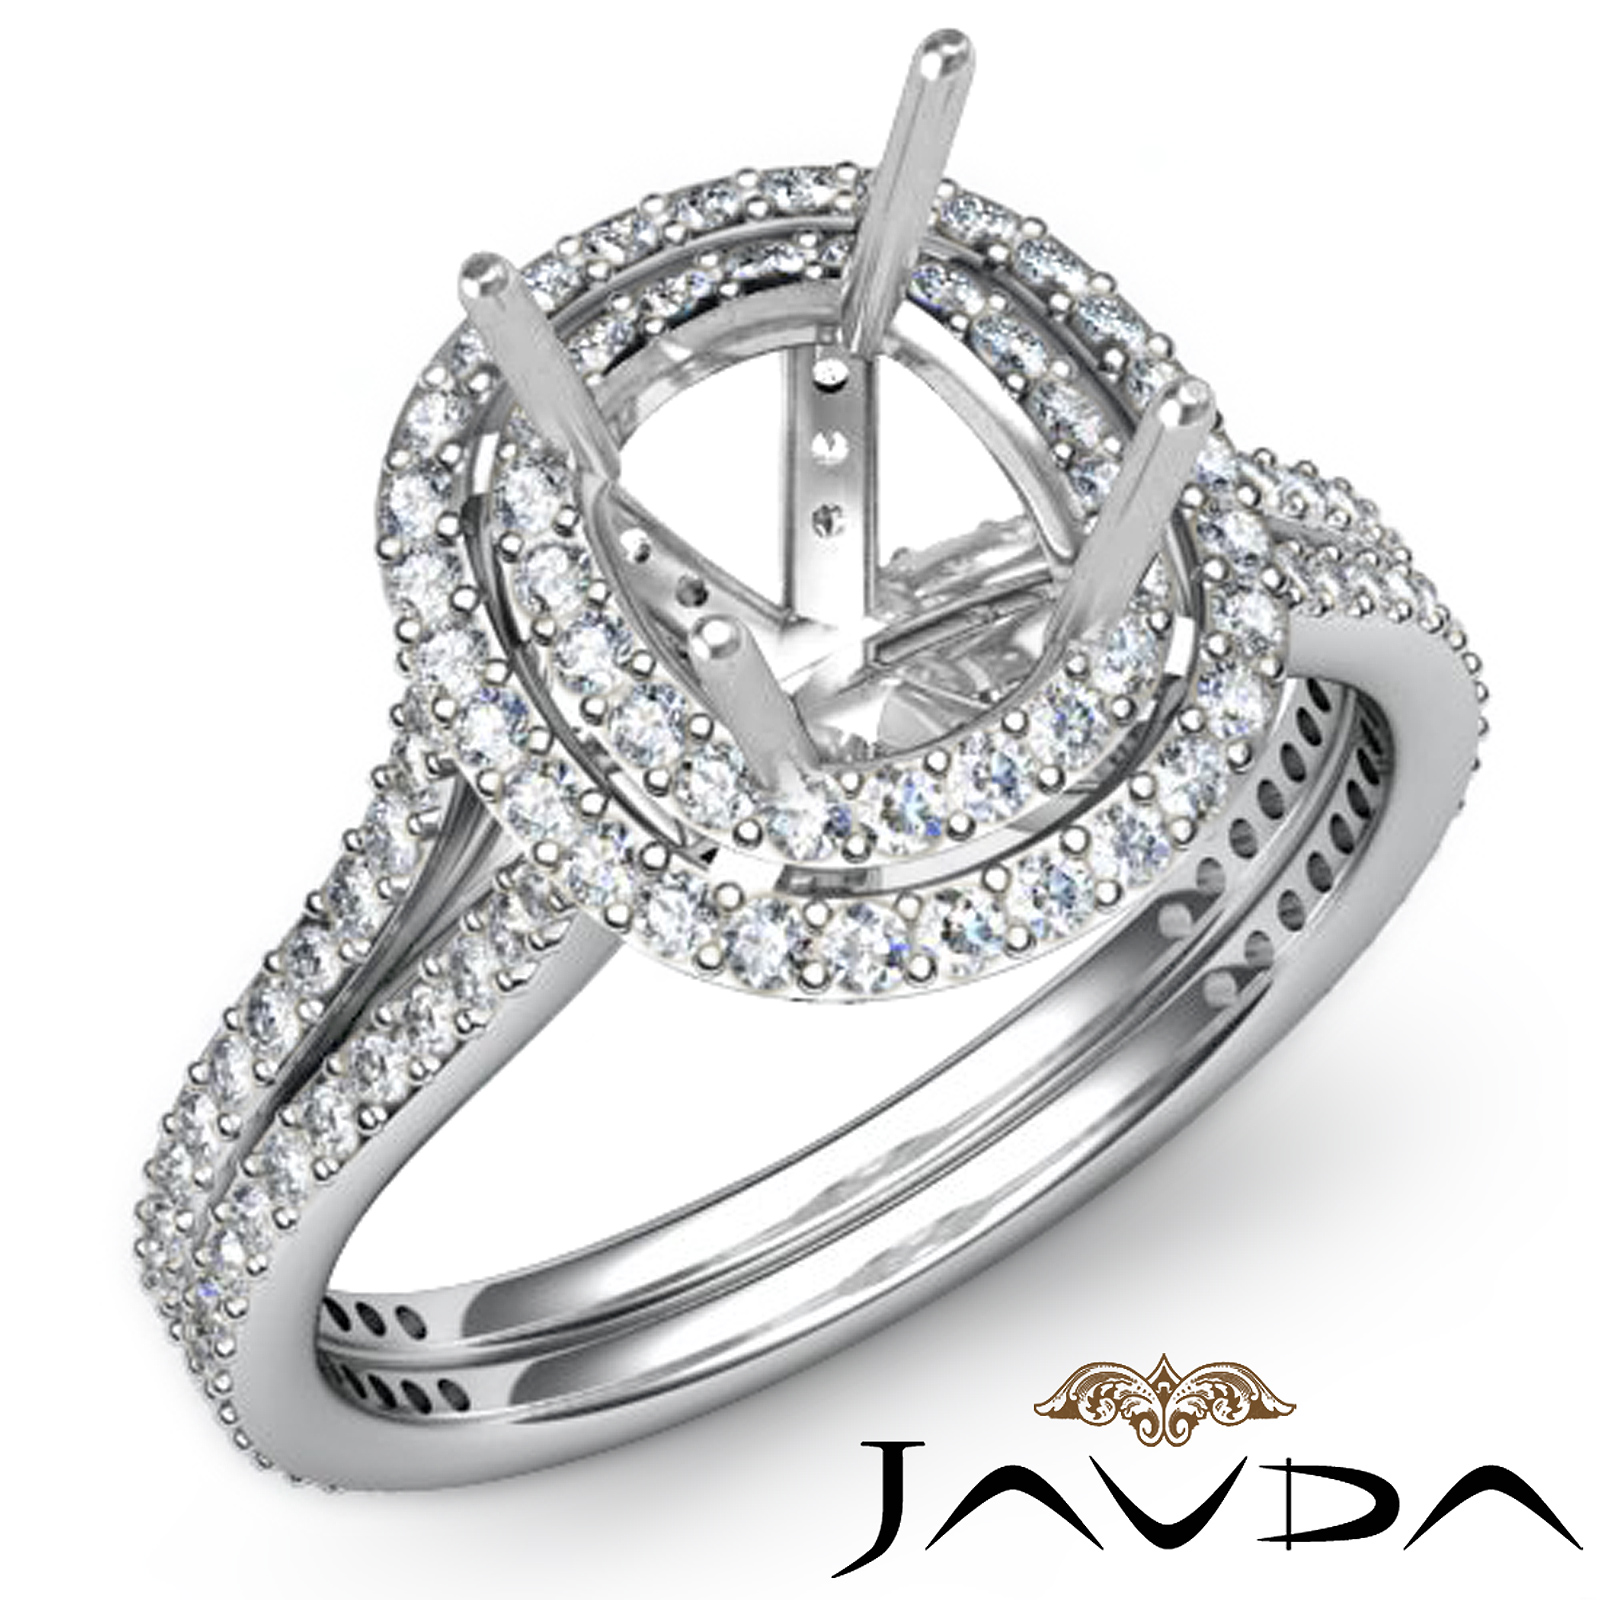 1 55ct Diamond Engagement Ring 14k White Gold Halo Setting